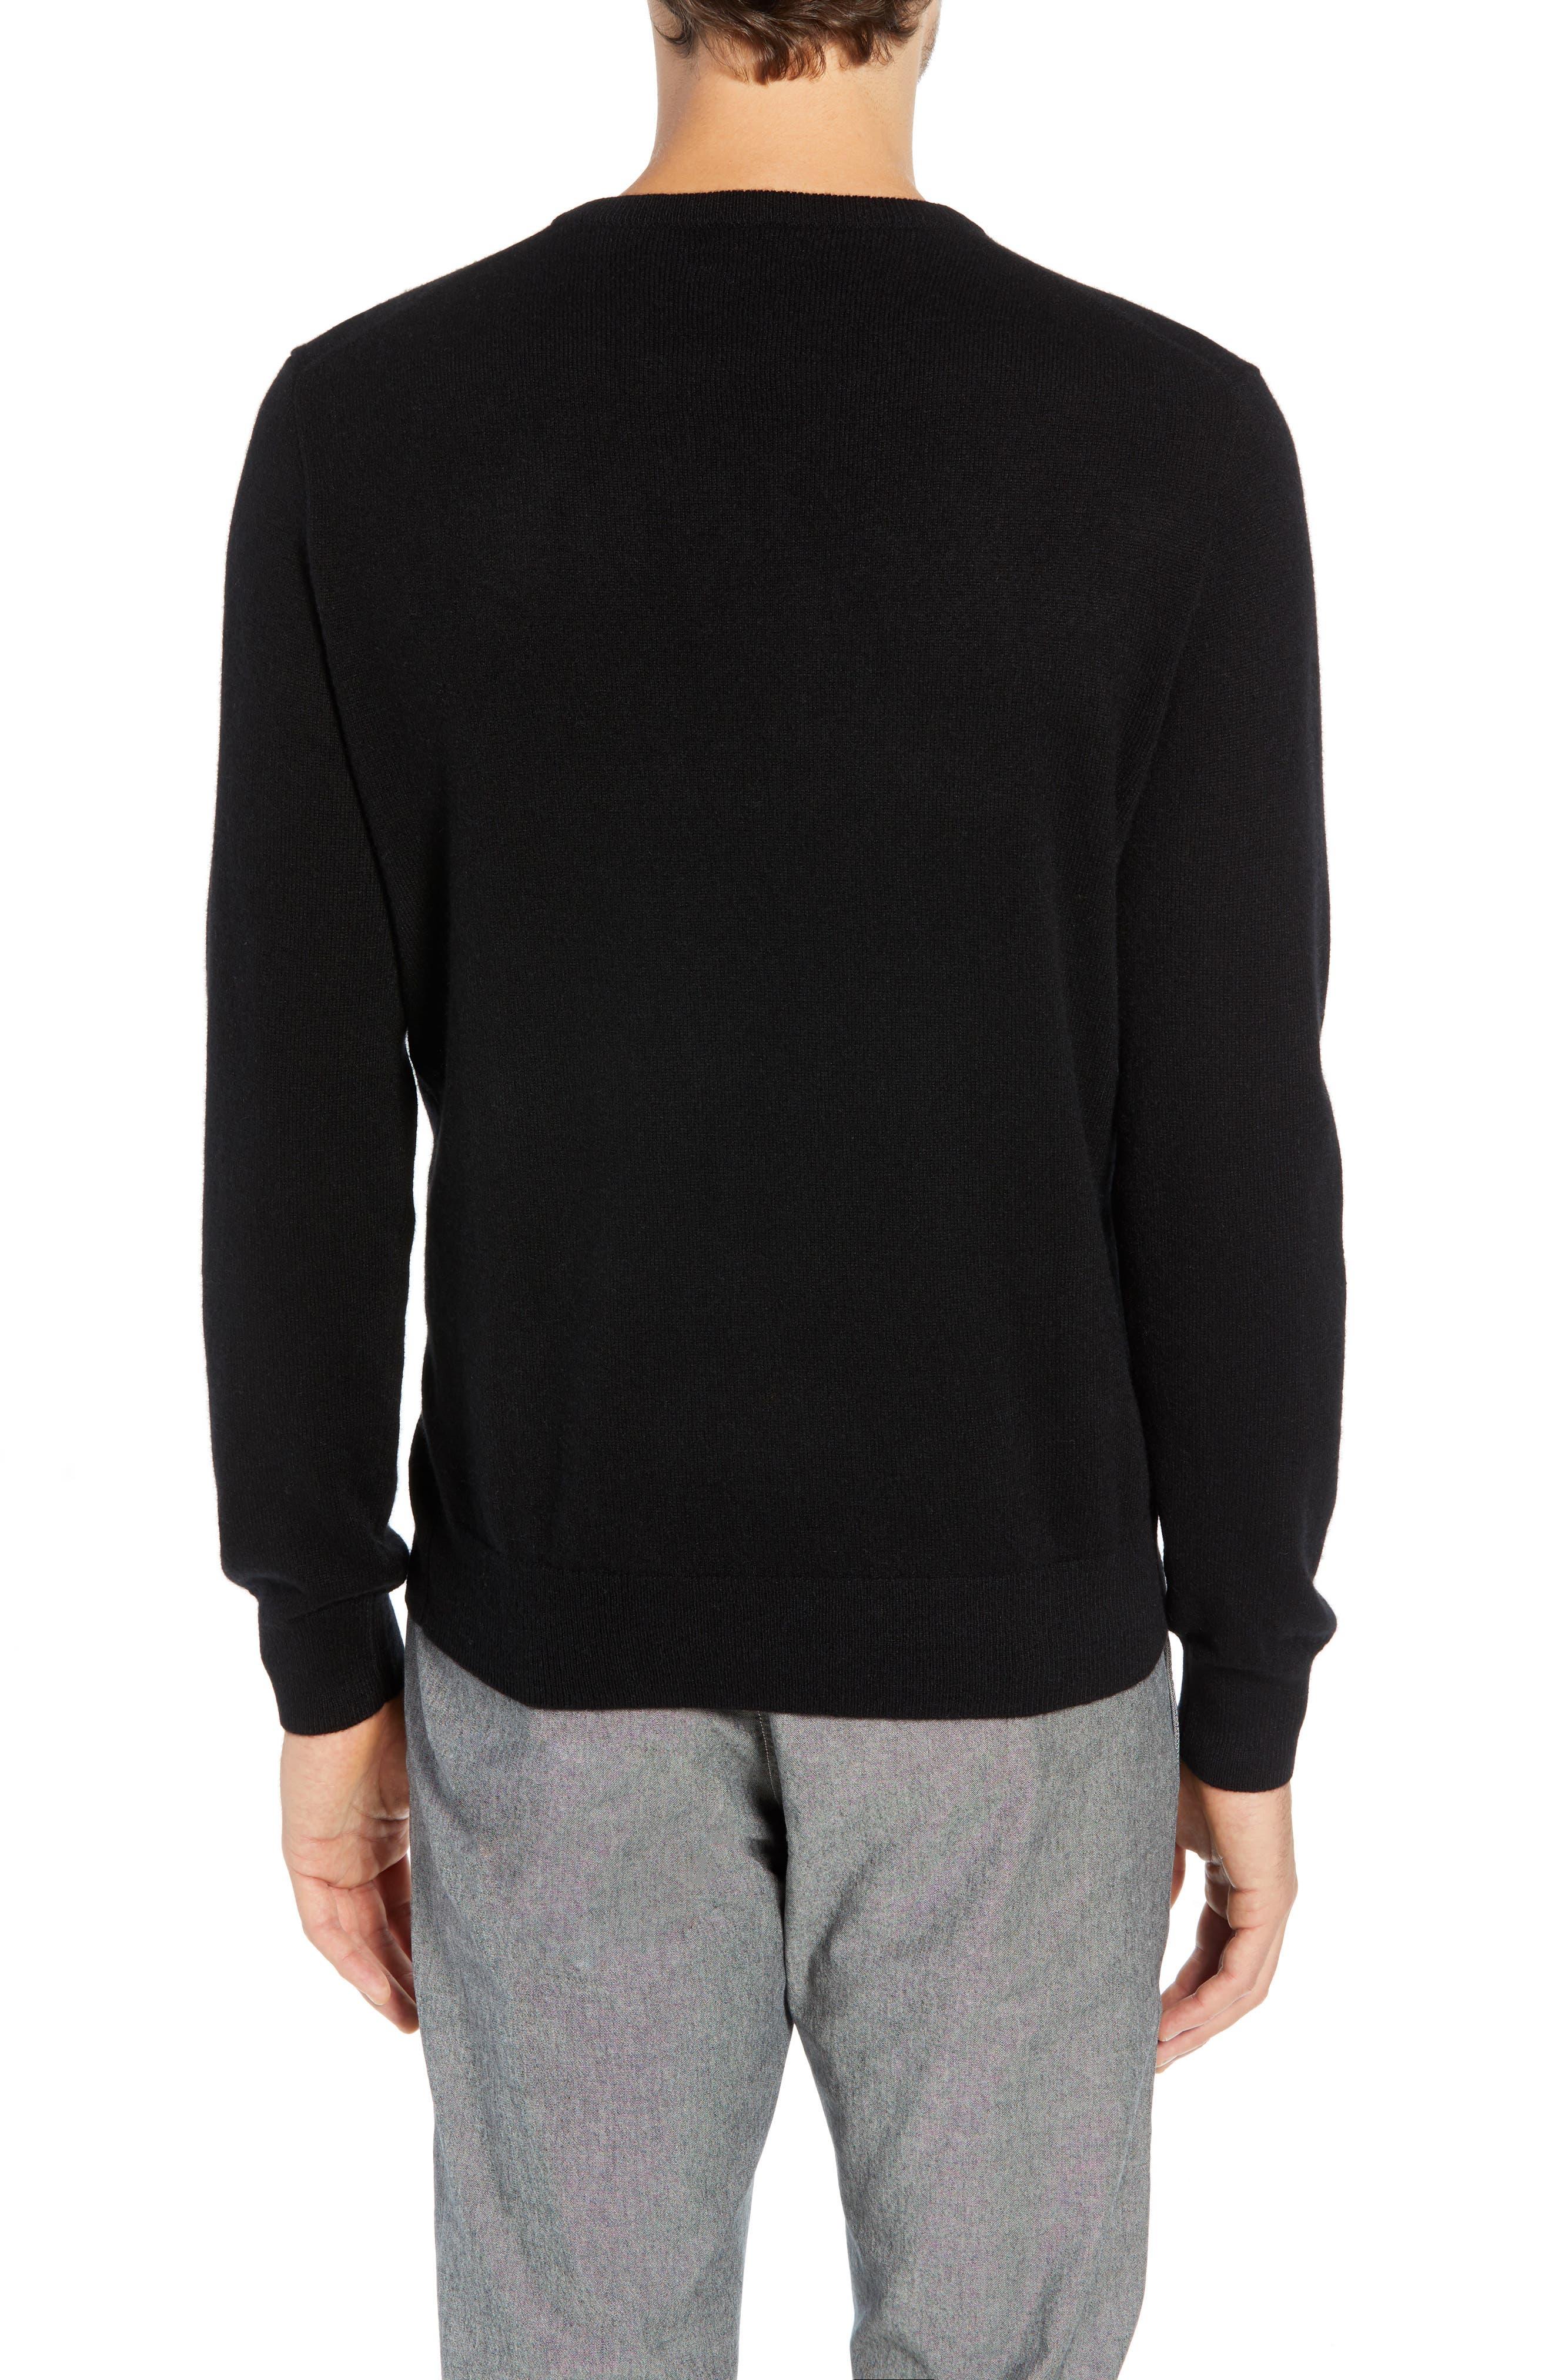 J.CREW,                             Everyday Cashmere Regular Fit V-Neck Sweater,                             Alternate thumbnail 2, color,                             001